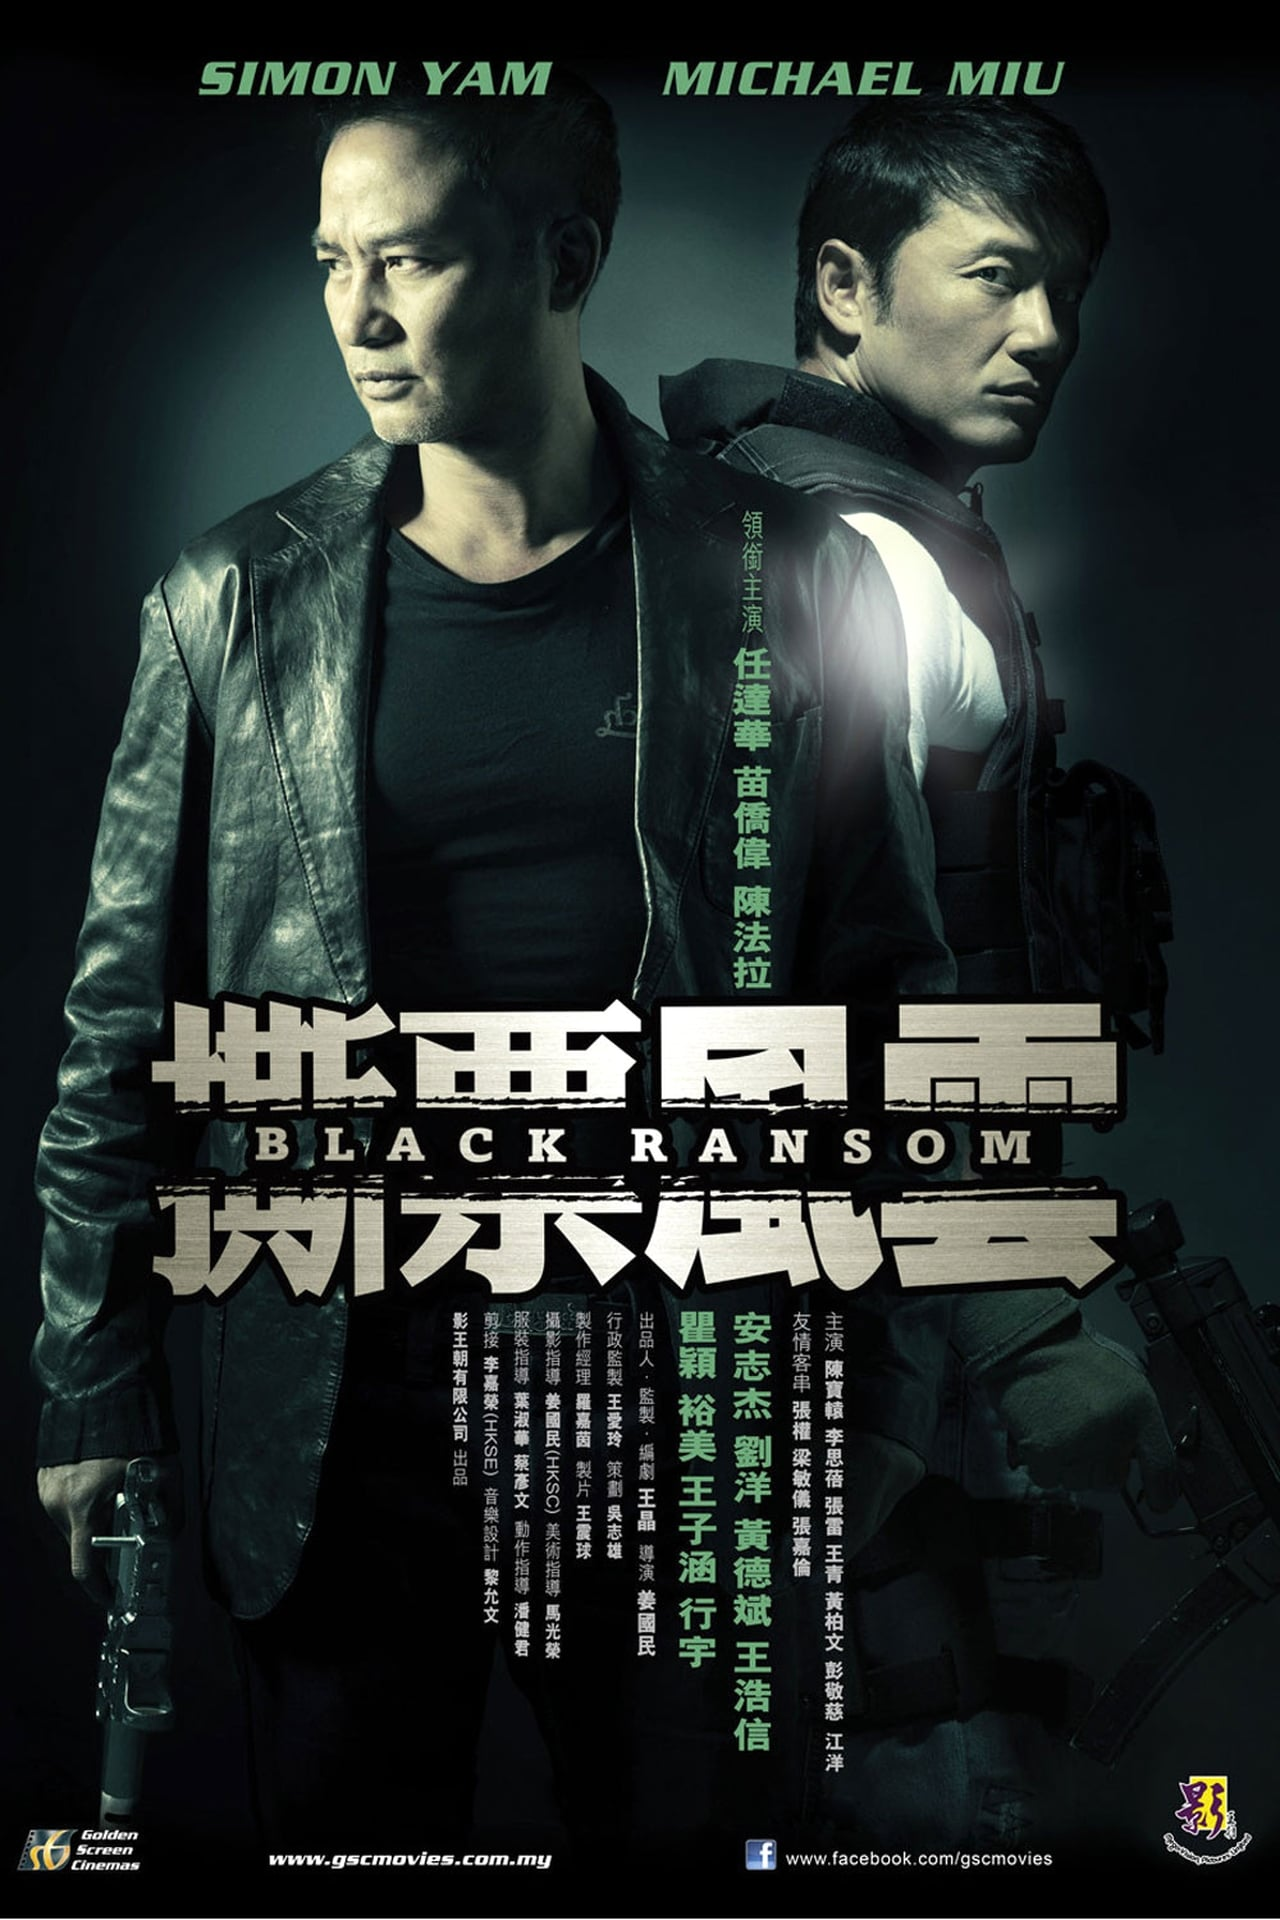 Black Ransom